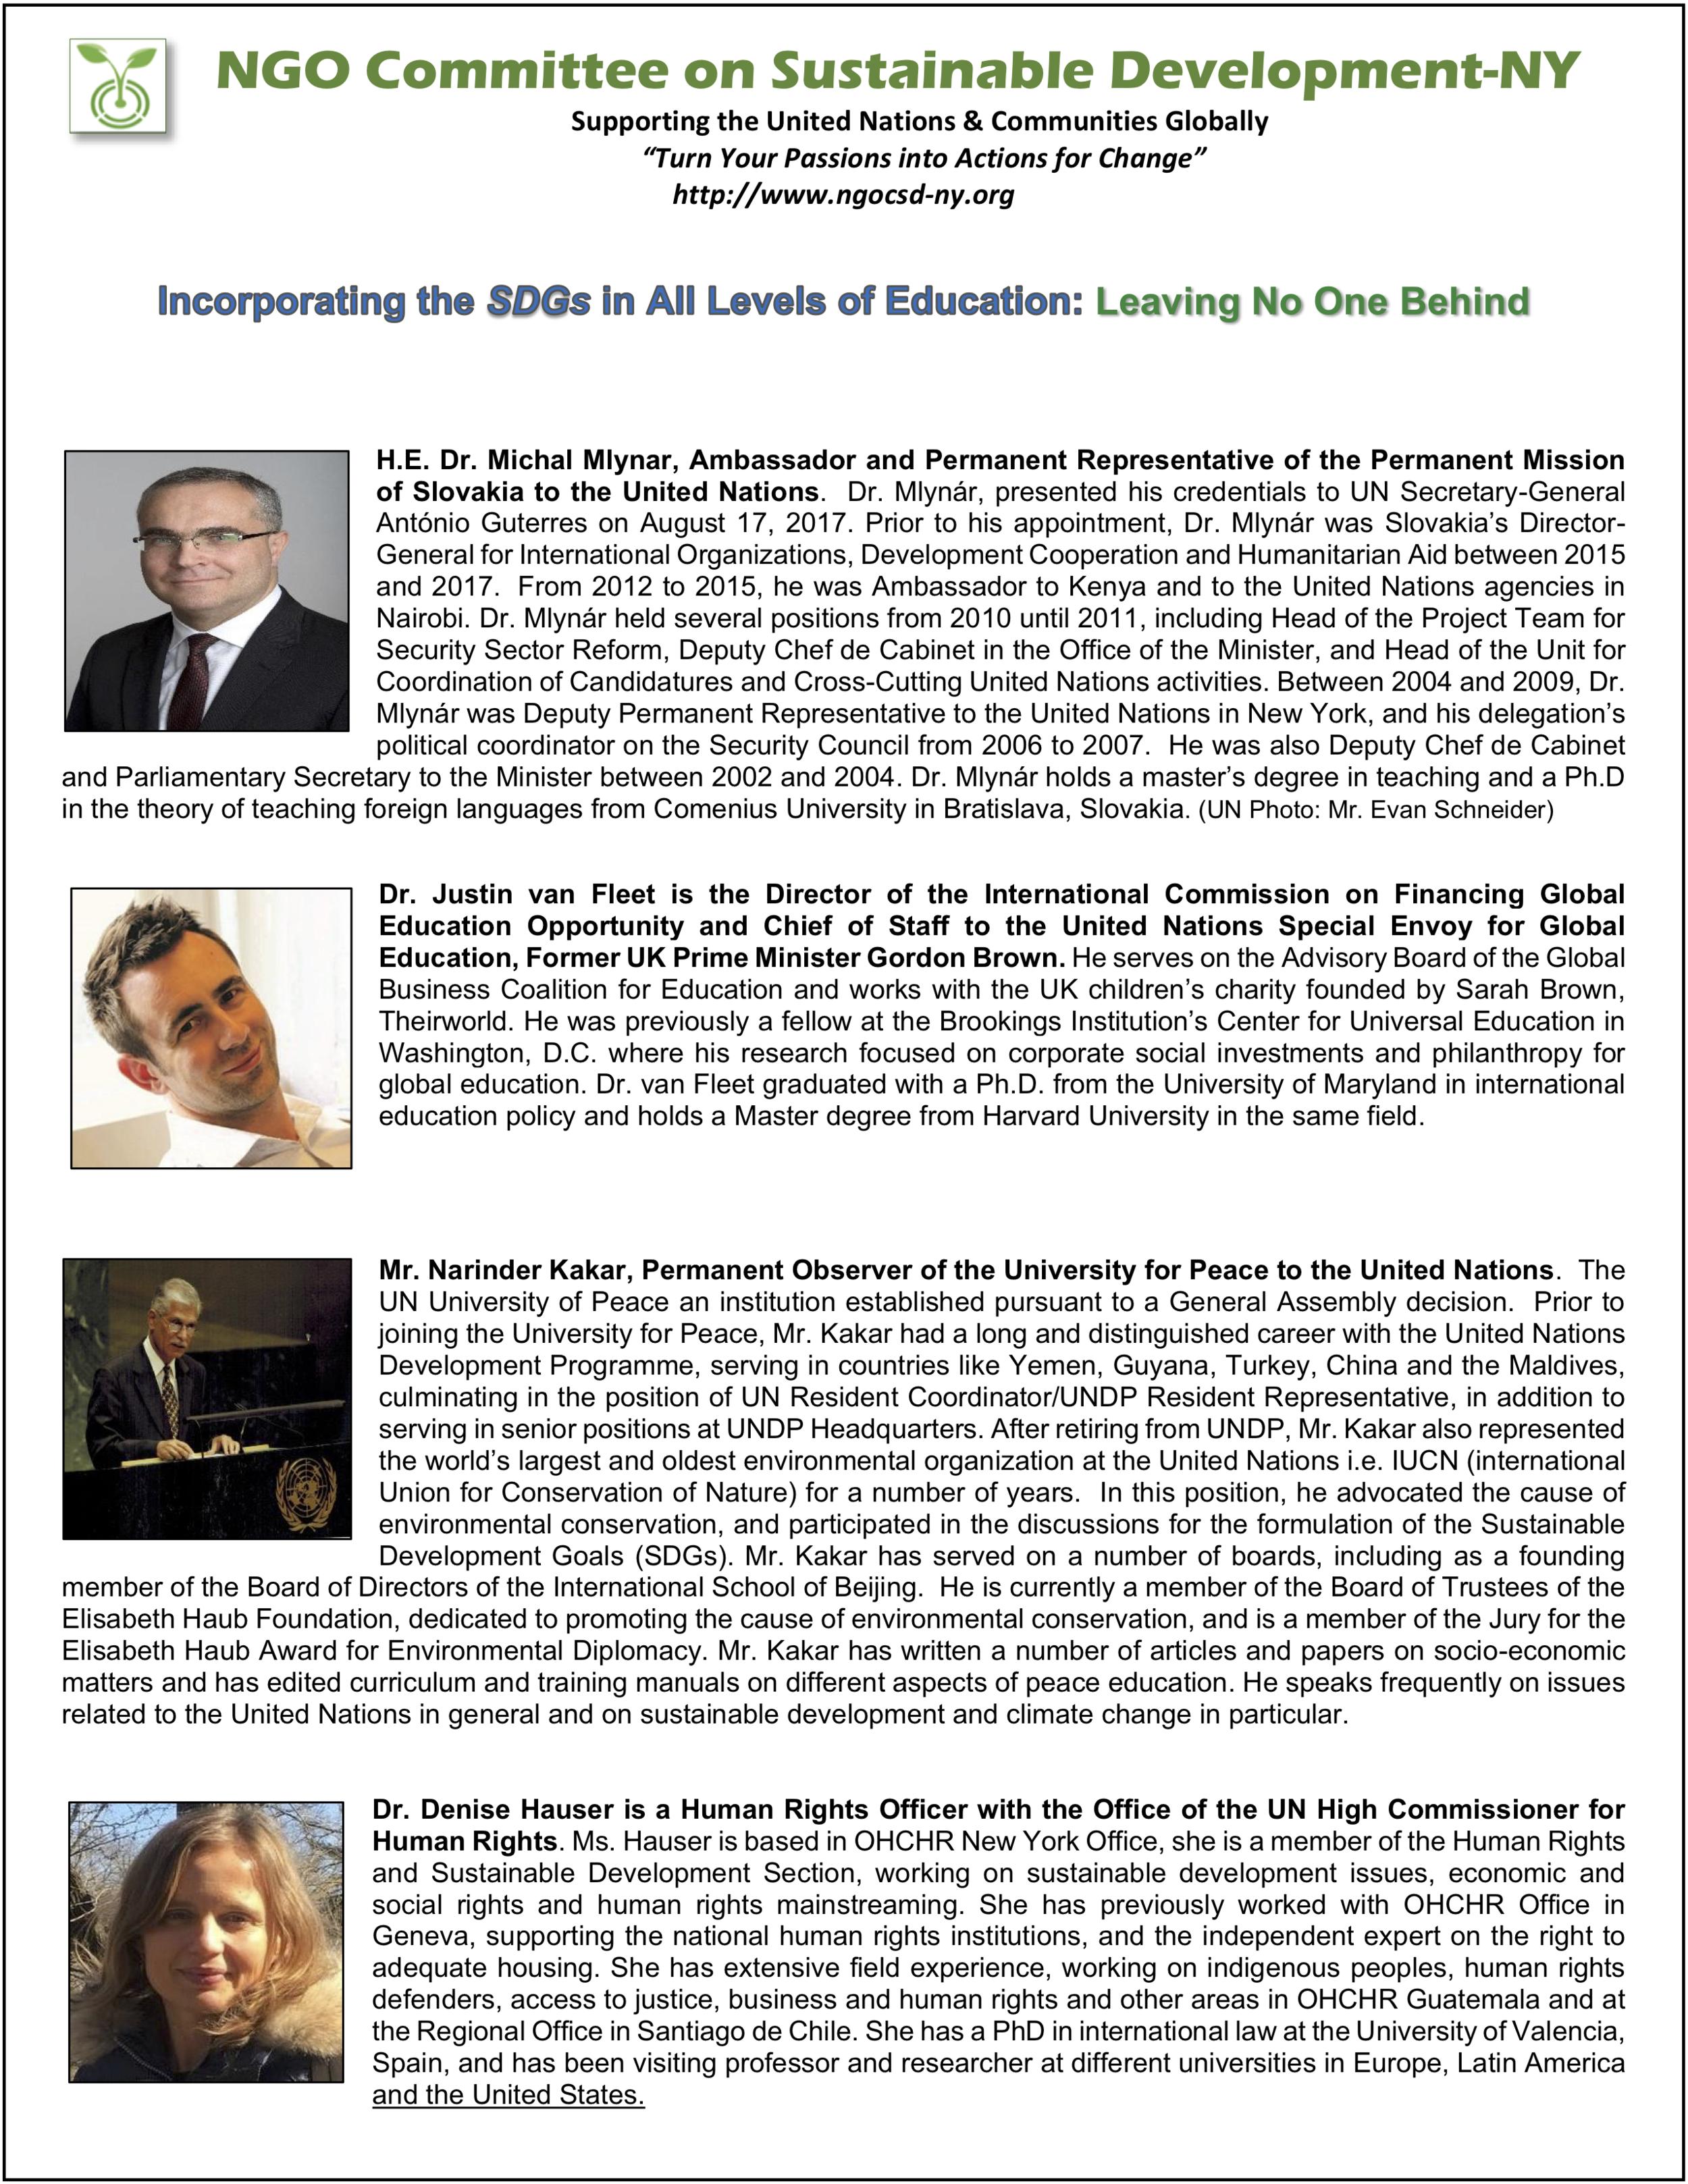 NGOCSD-NY+5-30-18+Inc.+SDGs+Educa.+Photo-Bios+A1c+(1).png